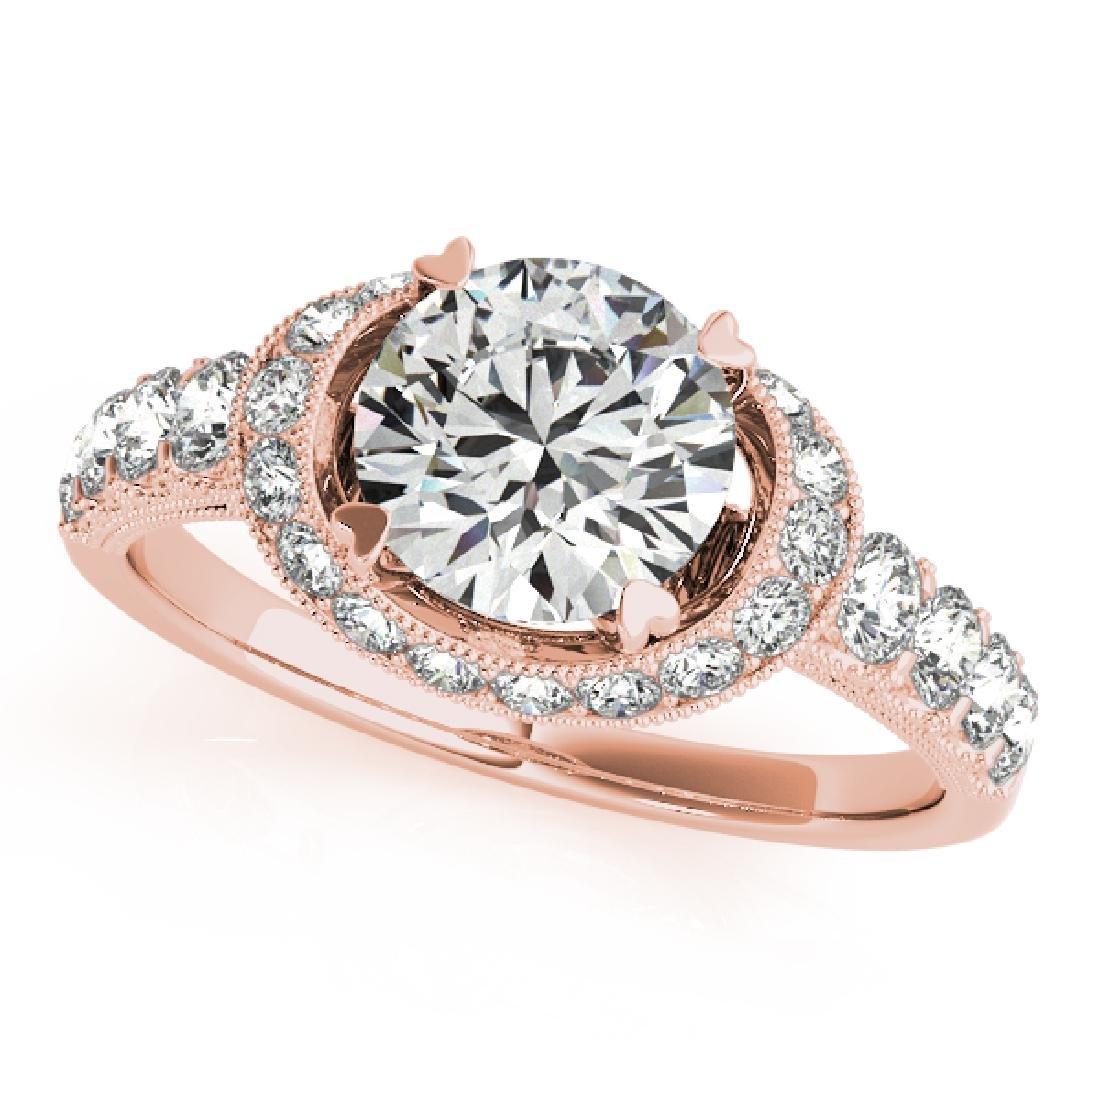 CERTIFIED 18K ROSE GOLD 1.14 CT G-H/VS-SI1 DIAMOND HALO